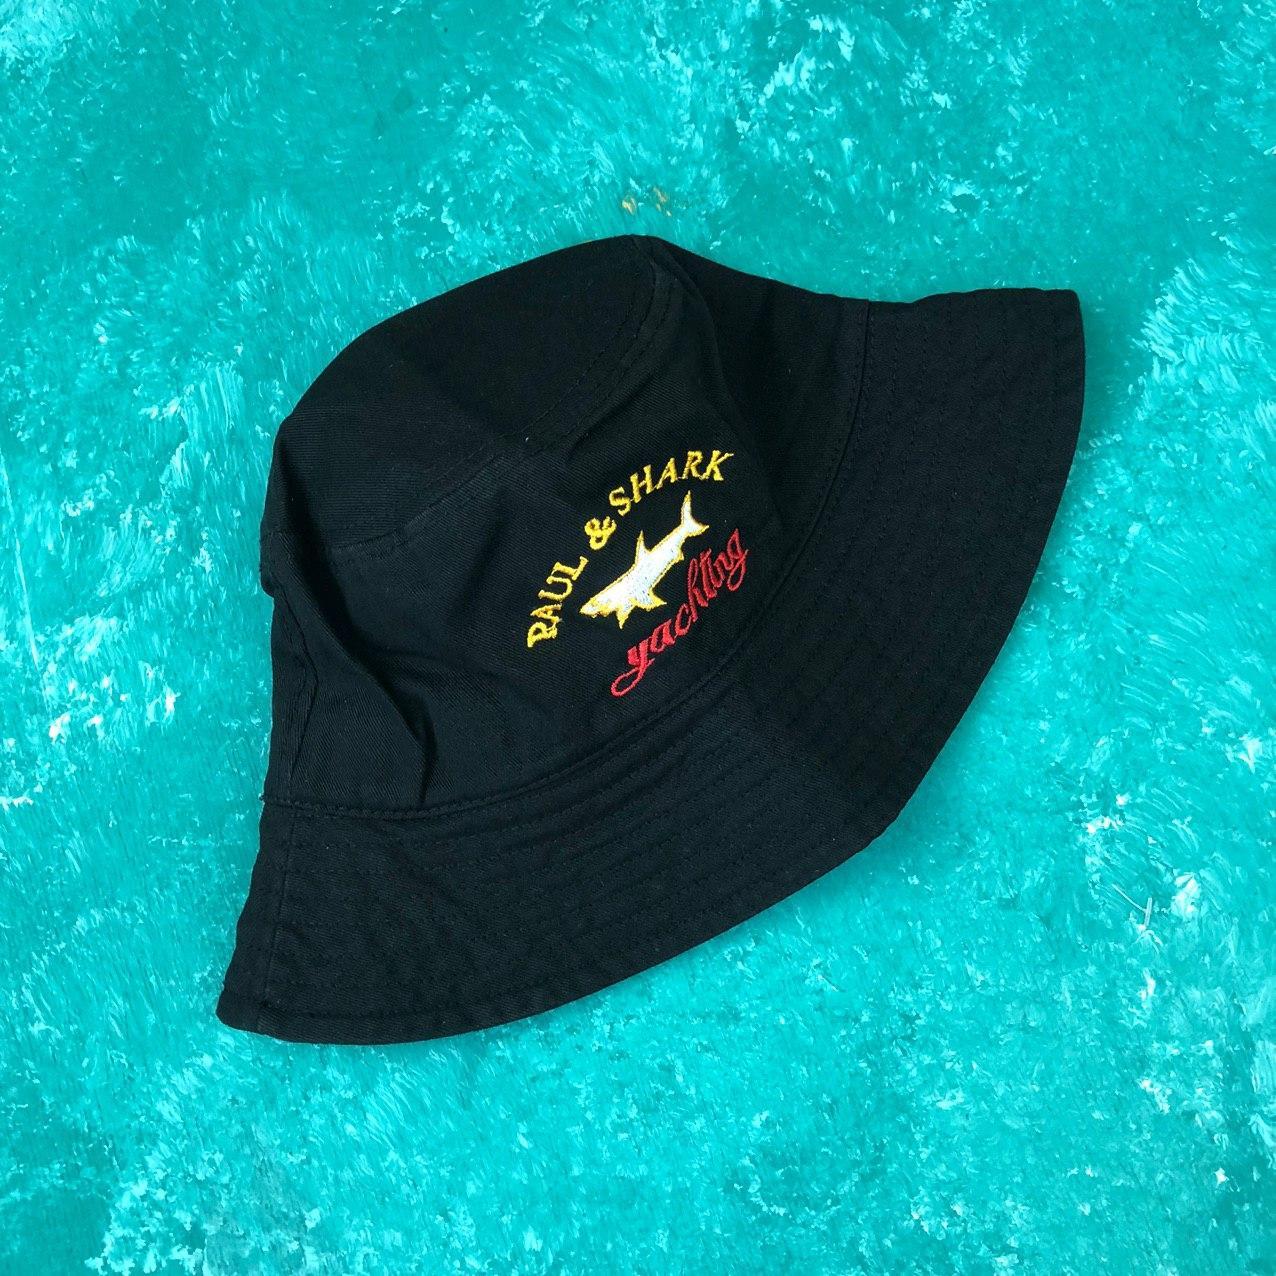 Панама Bucket Hat Paul Shark Черная